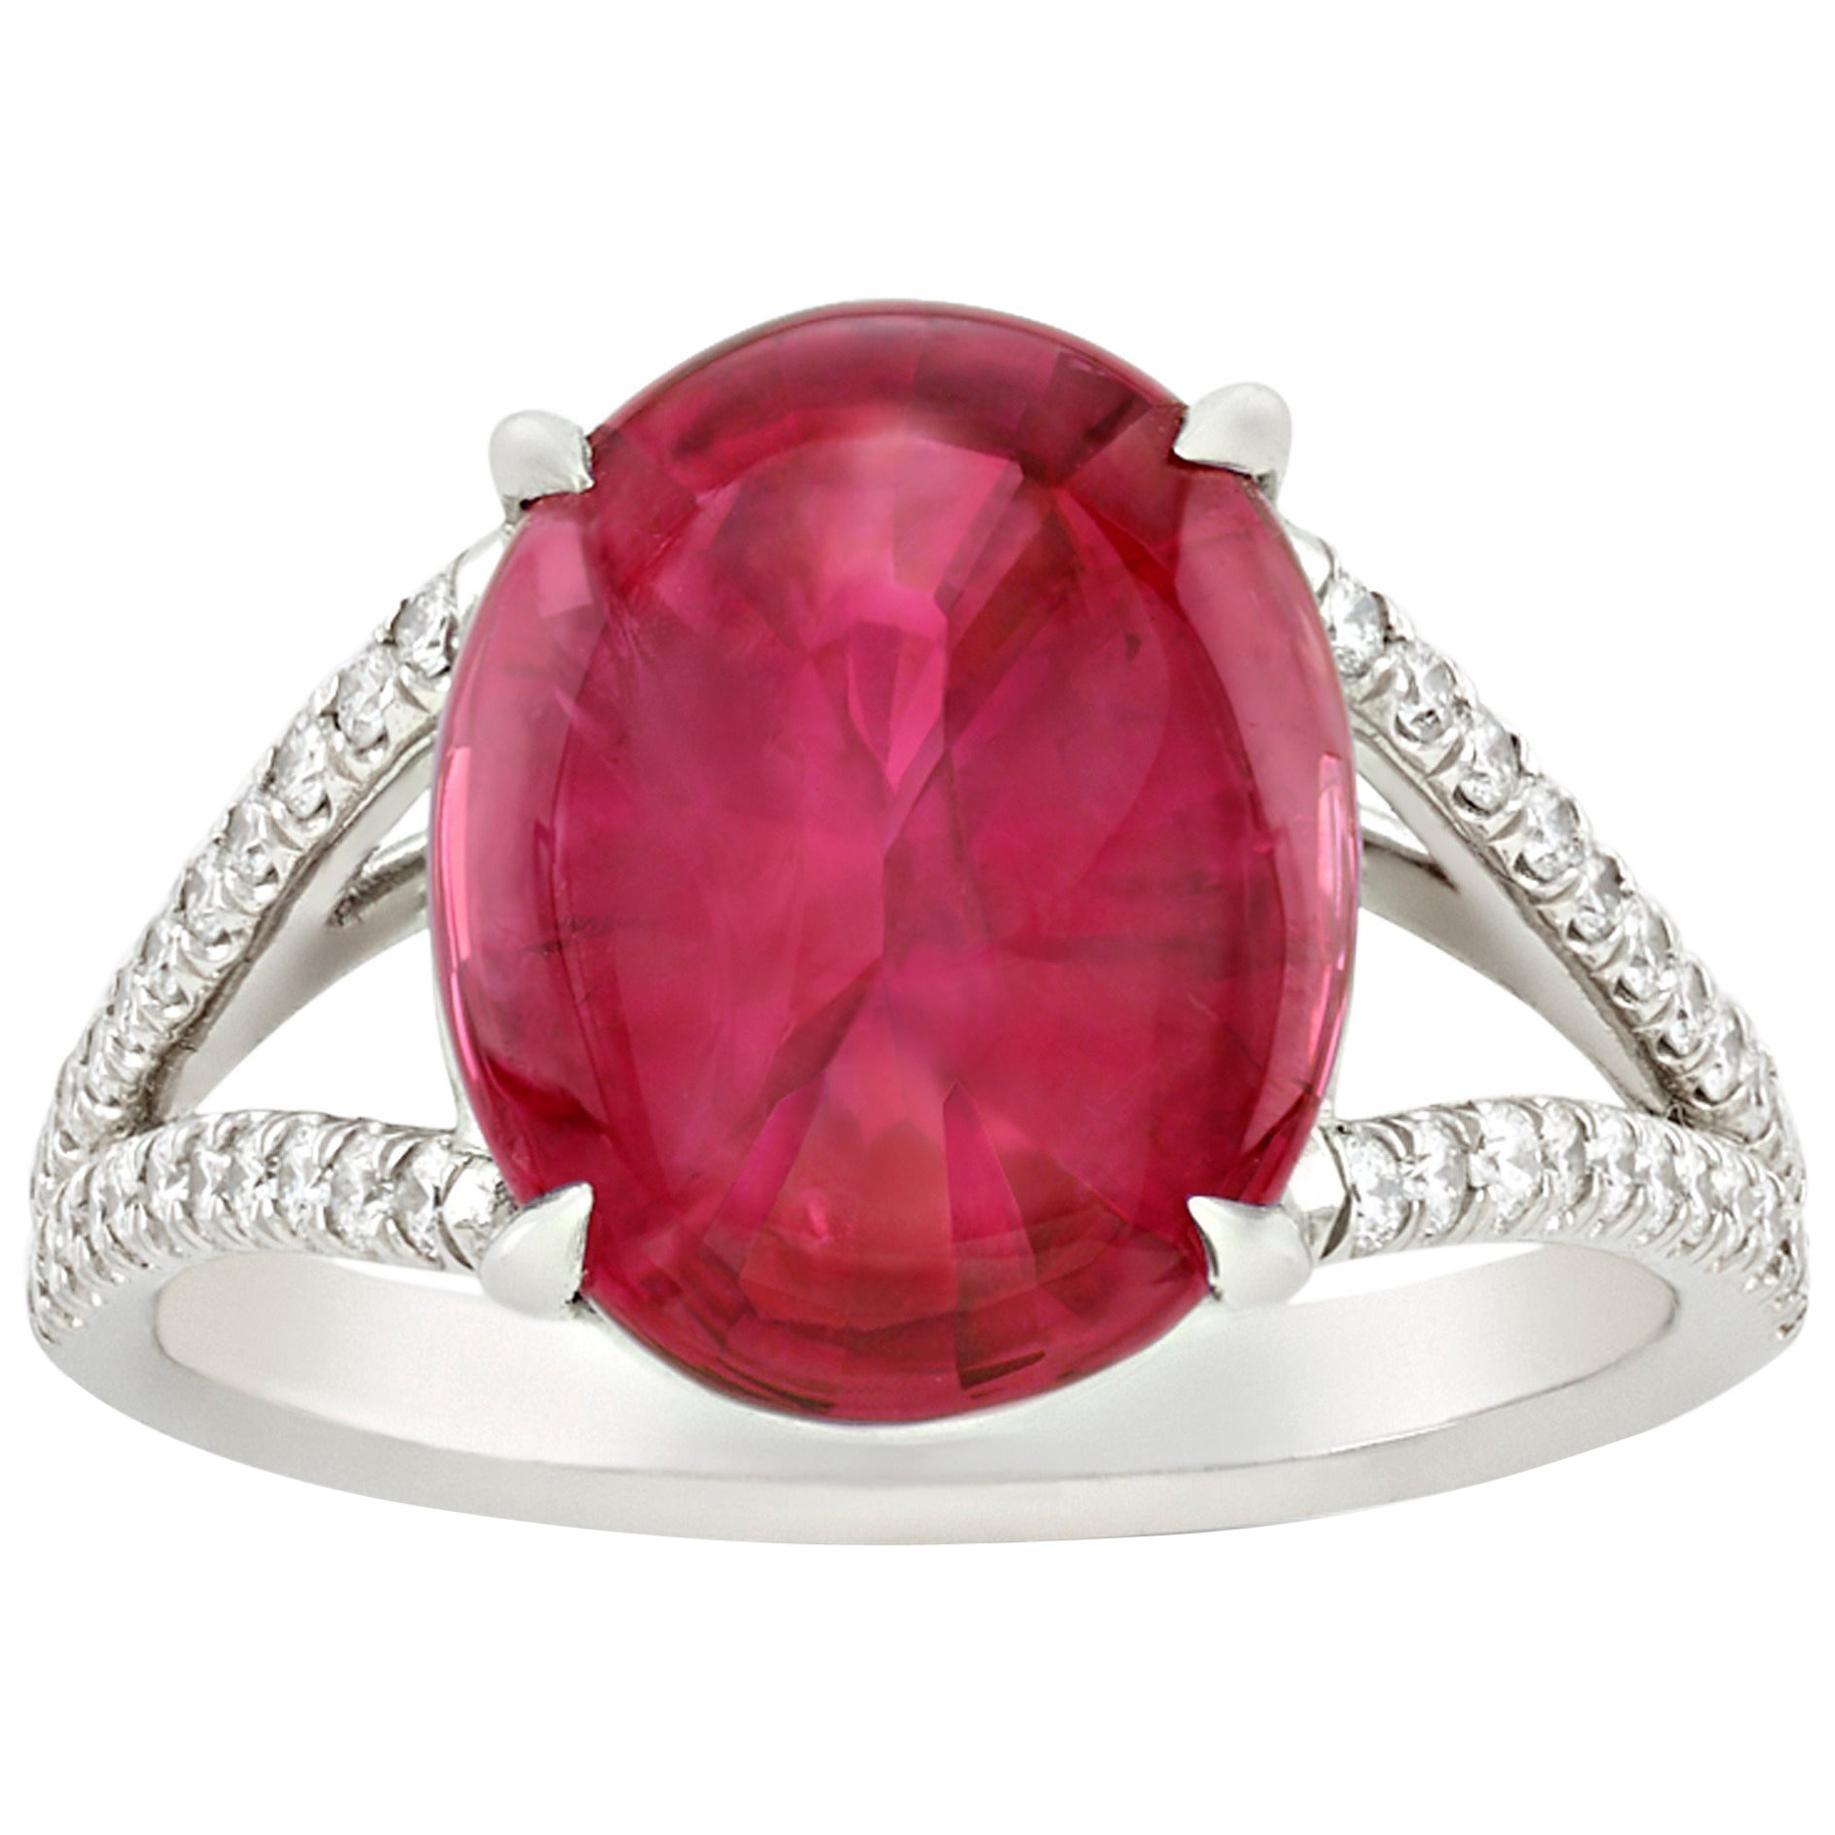 Cabochon Ruby Ring, 8.03 Carat